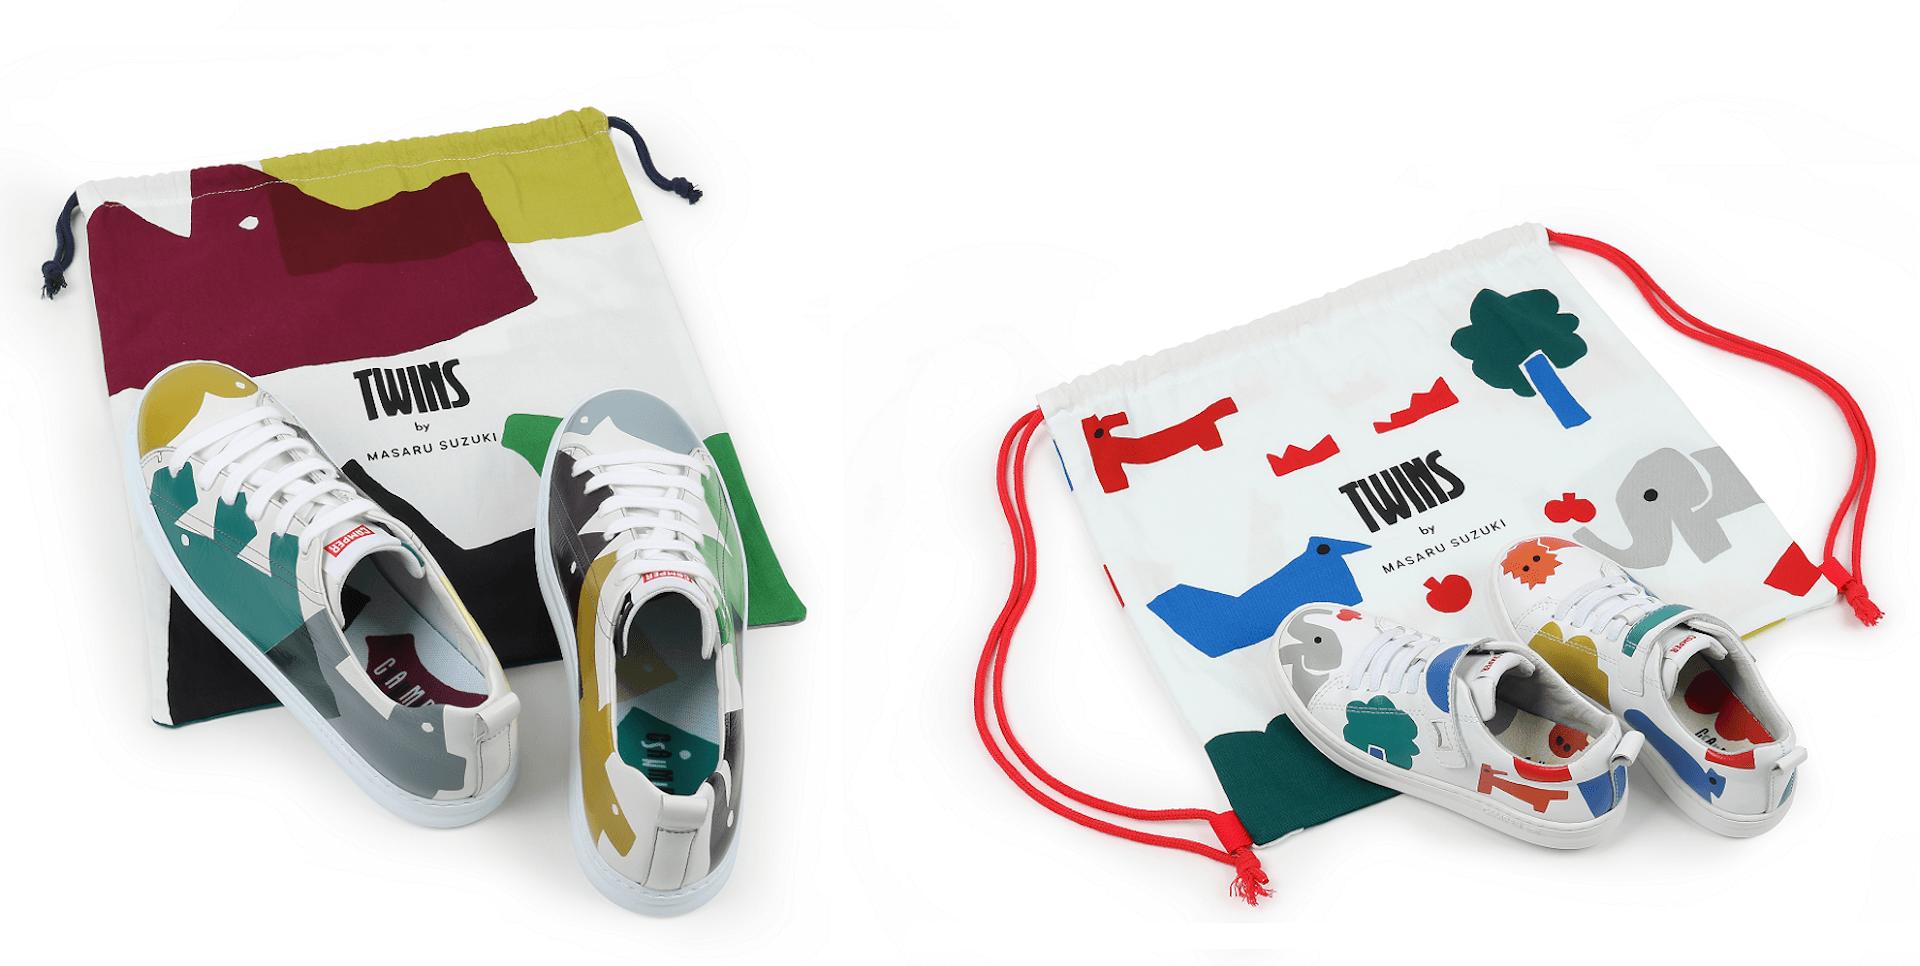 CAMPERと鈴木マサルが3度目のコラボコレクションを発表!RUNNERをベースにしたシューズや新作バッグなどが登場 fashion210118_camper_suzukimasaru_5